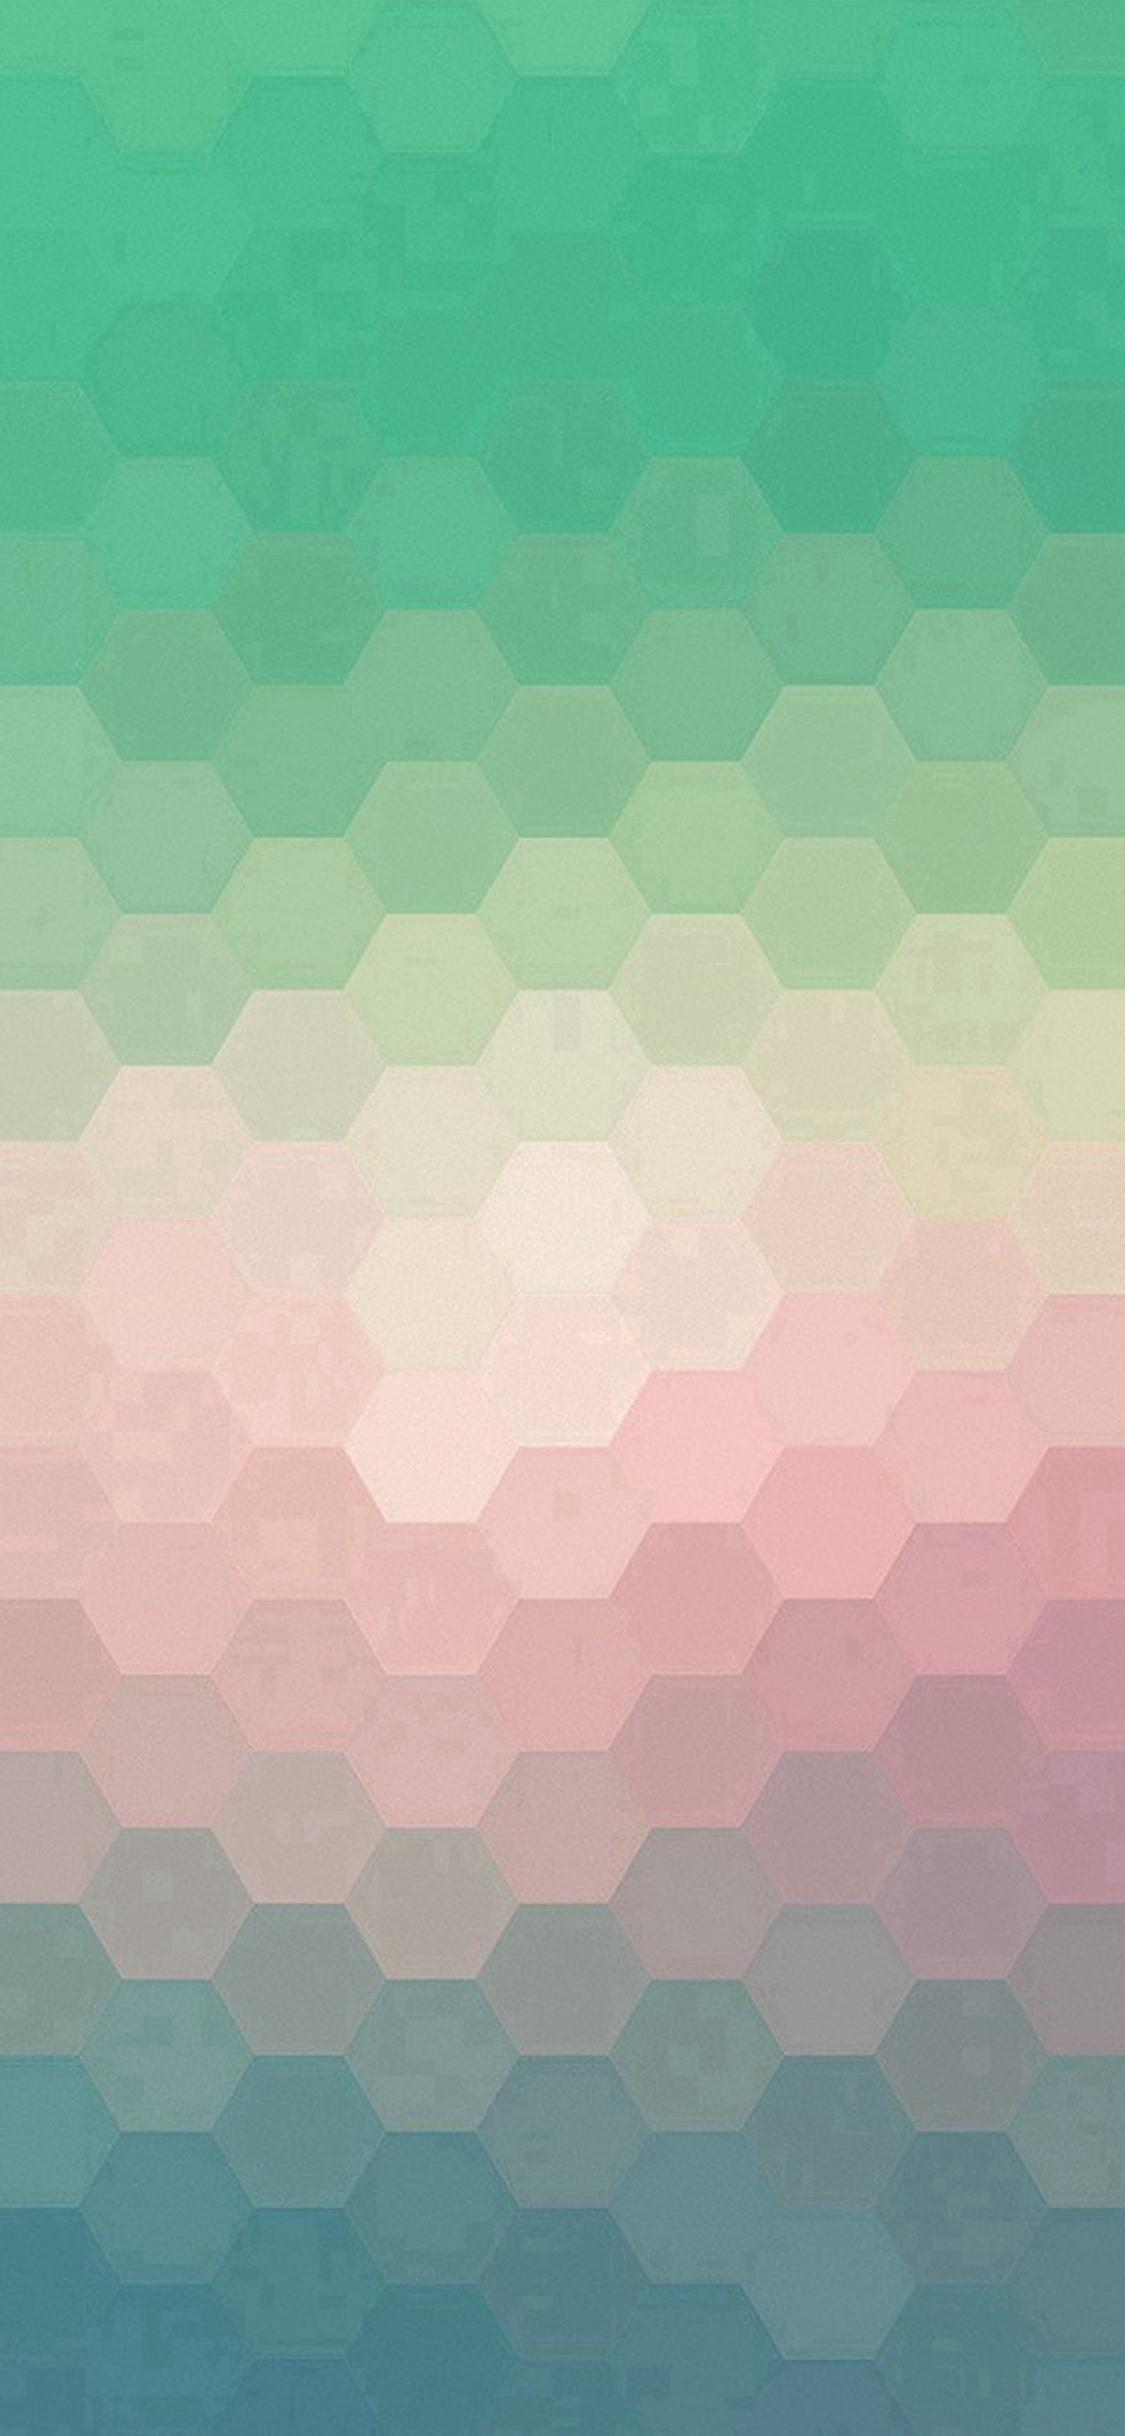 Hexagon Green Red Pattern Background IPhone X Wallpaper